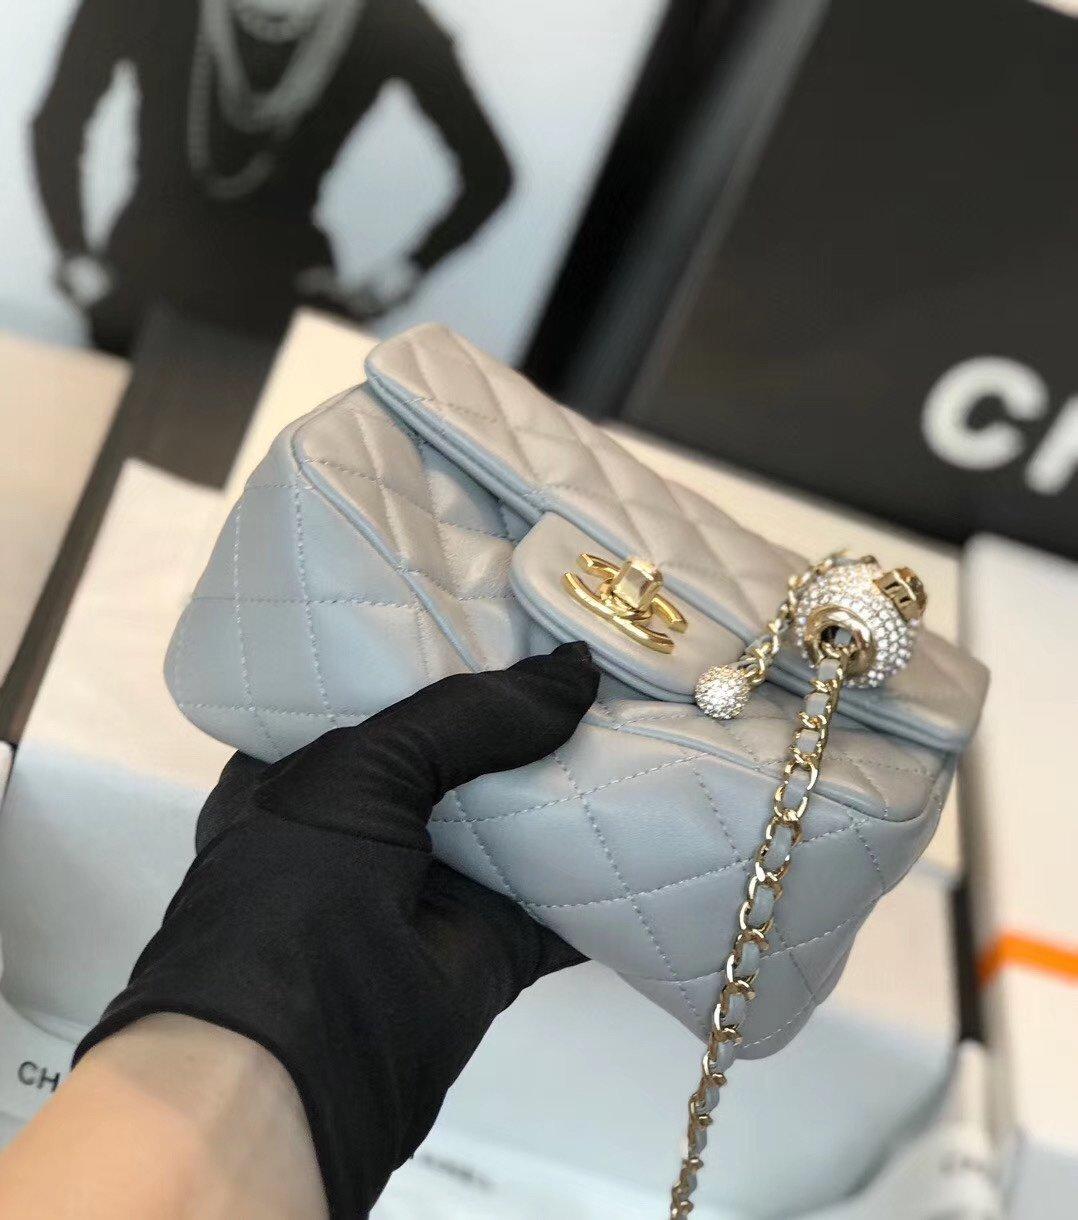 Chanel香奈儿专柜最新钻珠cf款(图4)